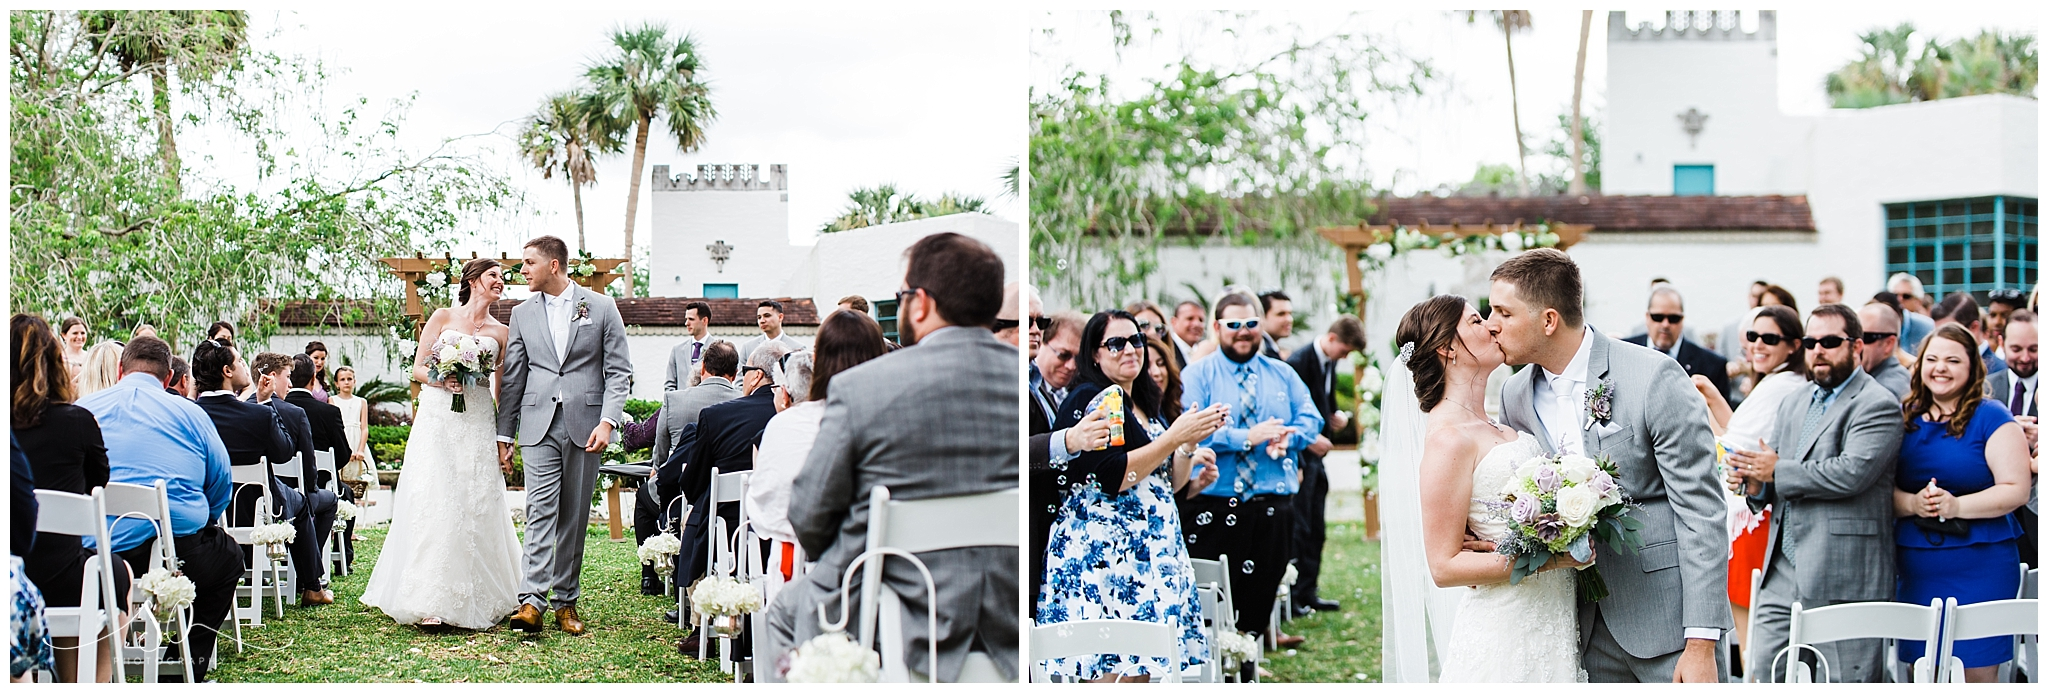 maitland art center wedding_0059.jpg